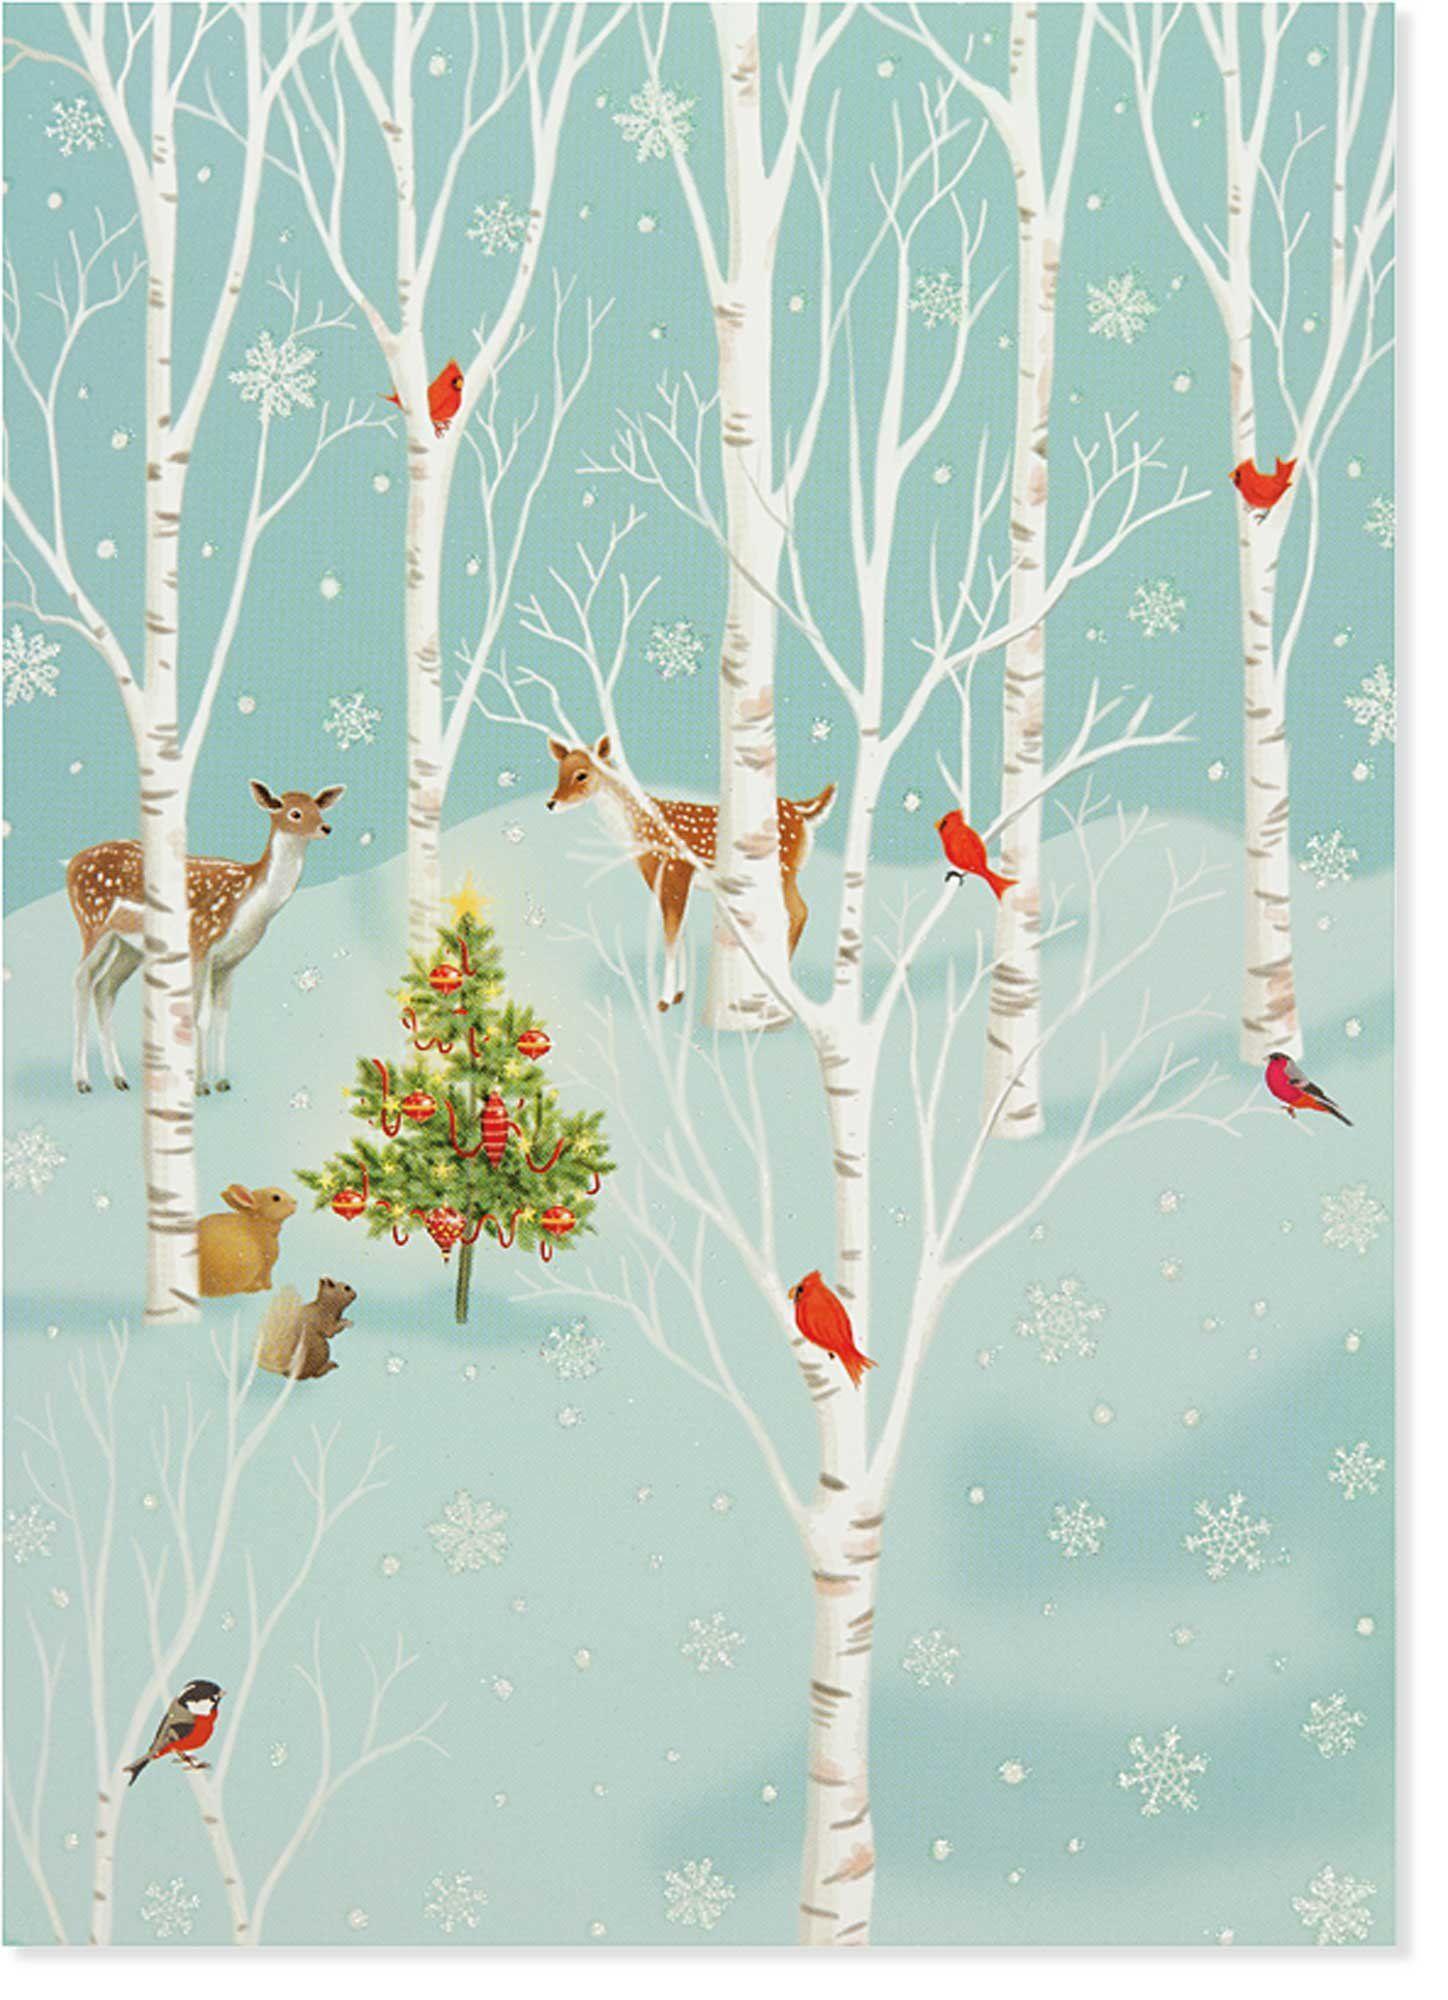 Enchanted Glade Large Boxed Holiday Cards (Christmas Cards, Holiday ...